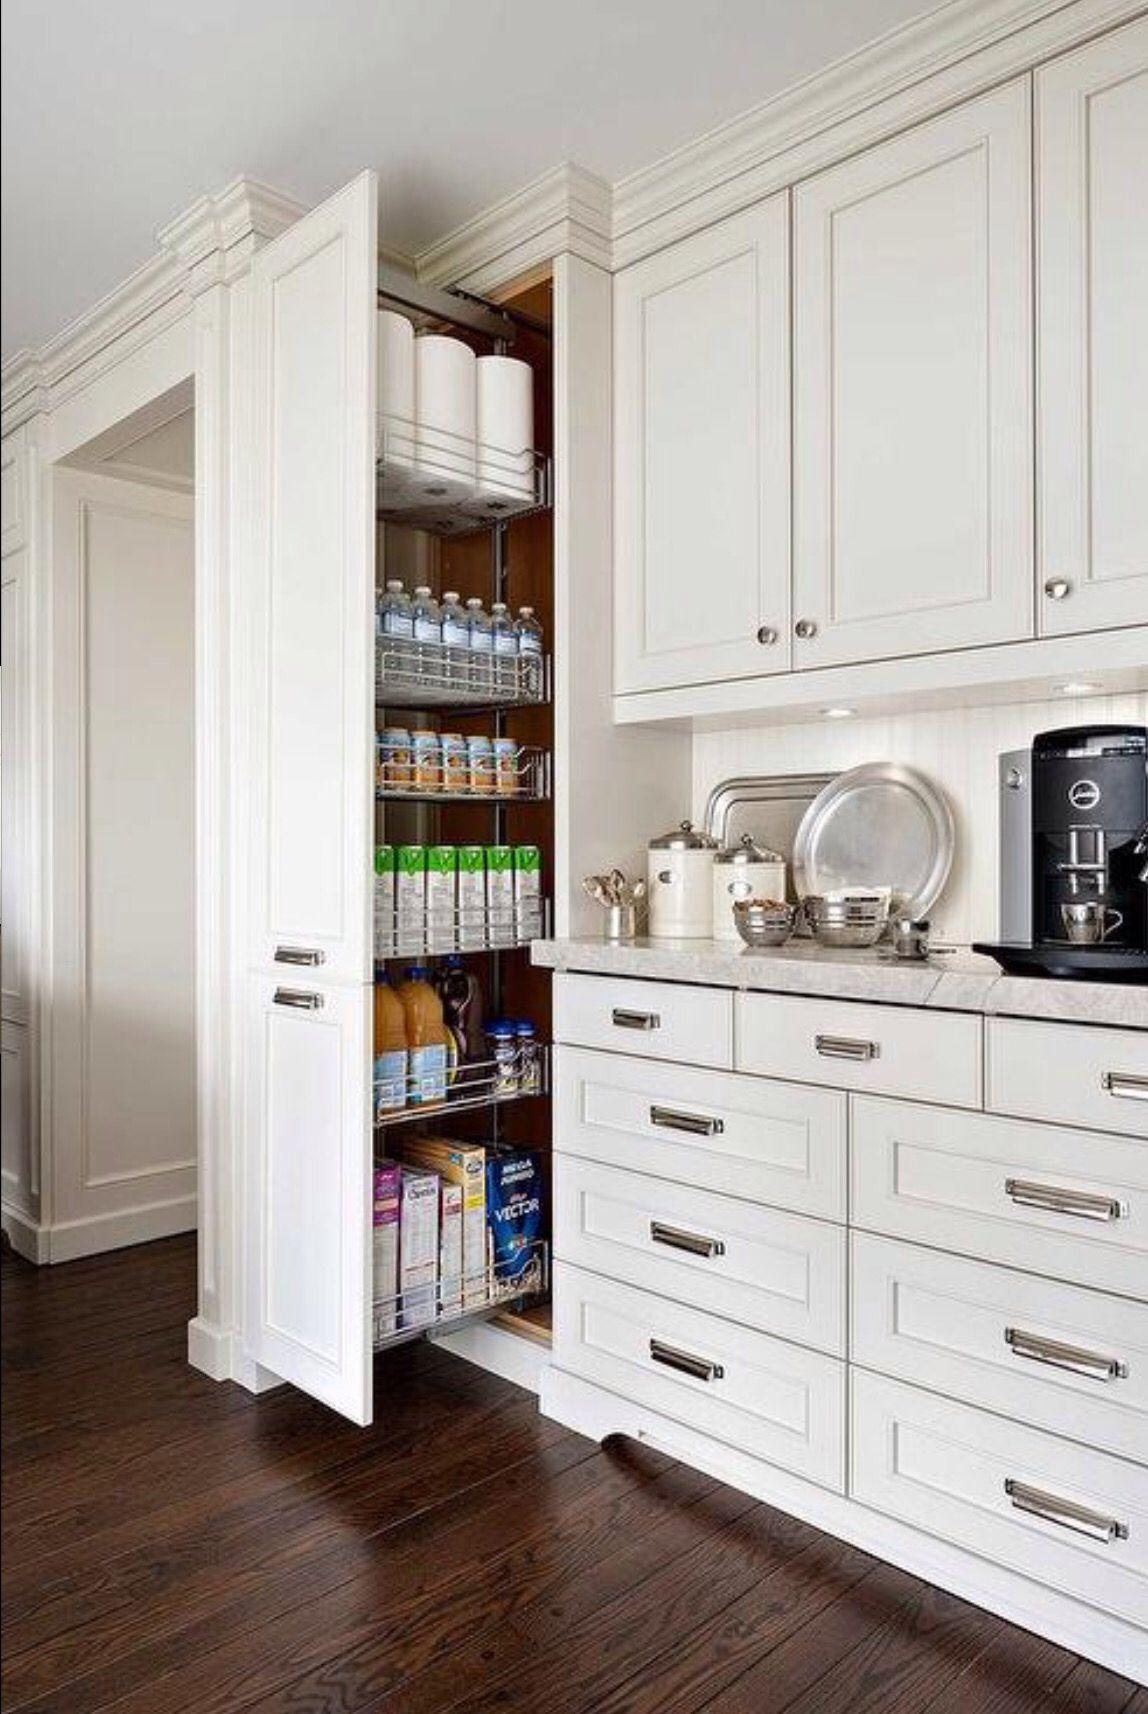 storage solution kitchen wall storage cabinets kitchen wall storage pantry design on kitchen organization cabinet layout id=43777